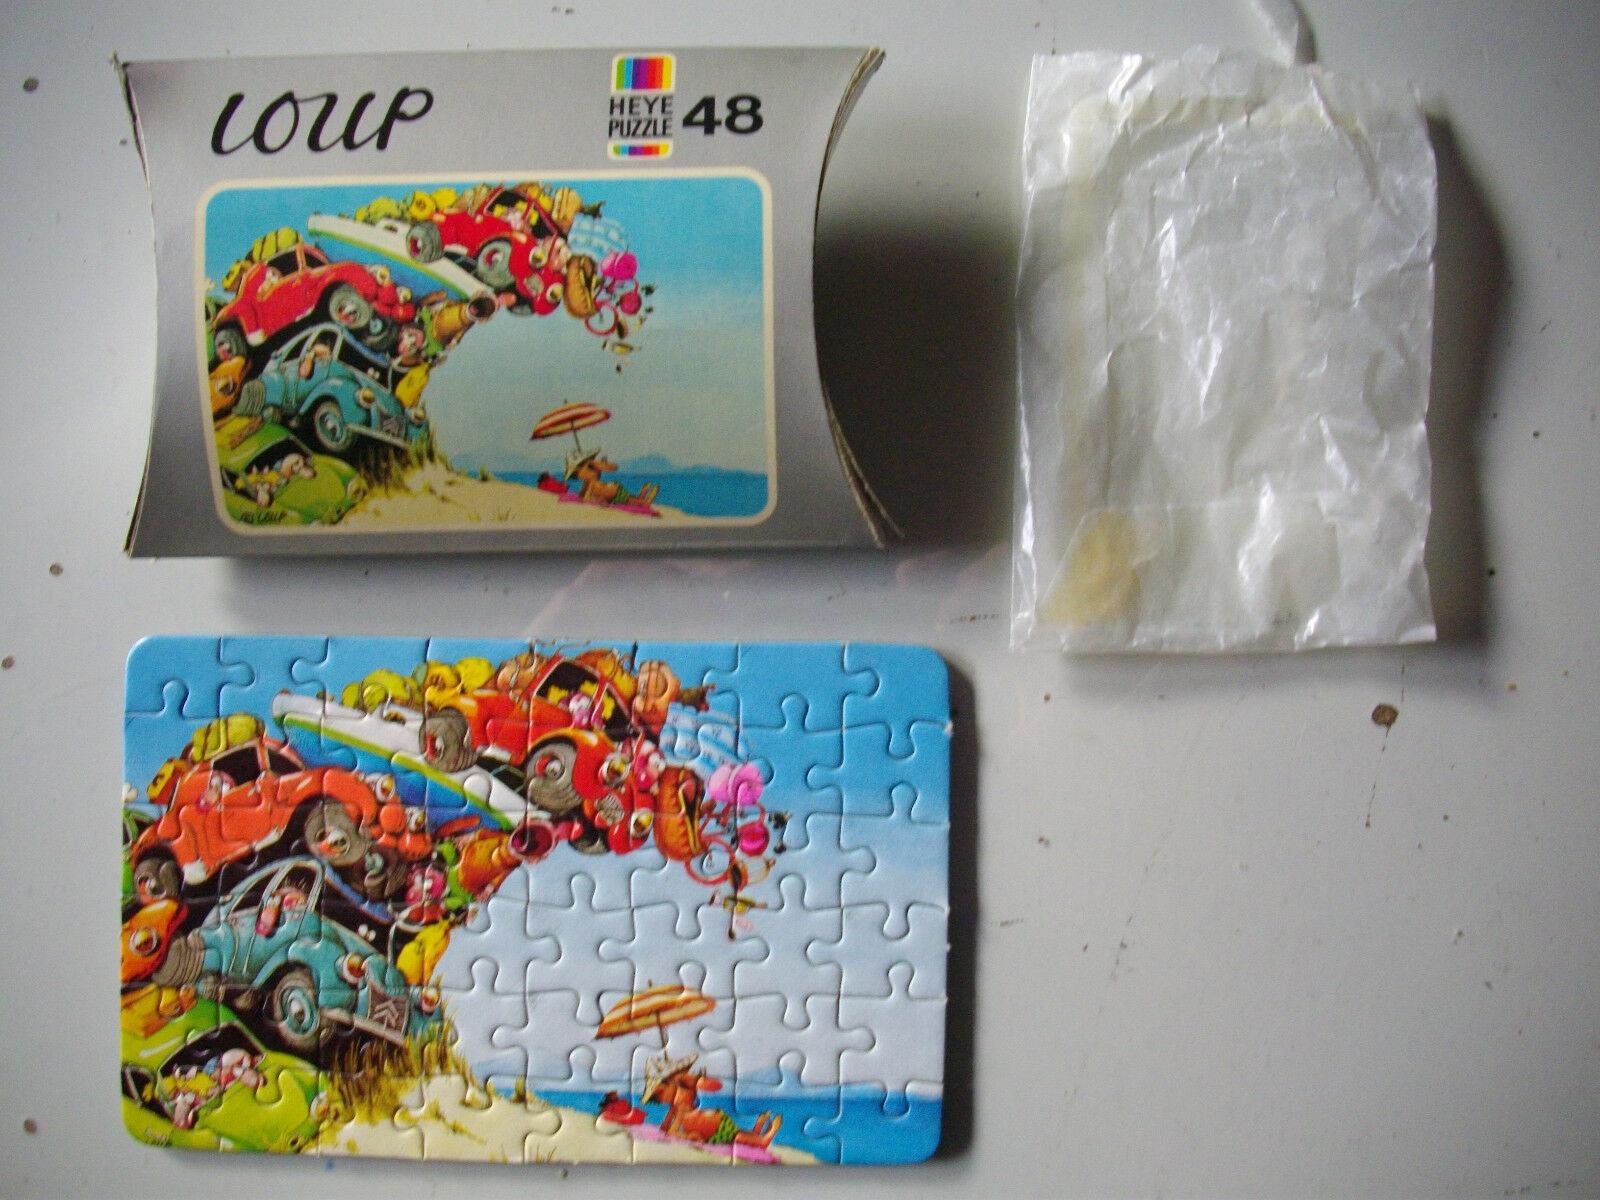 MINIPUZZLE  - HEYE PUZZLE (48 T.]) LOUP von 1978